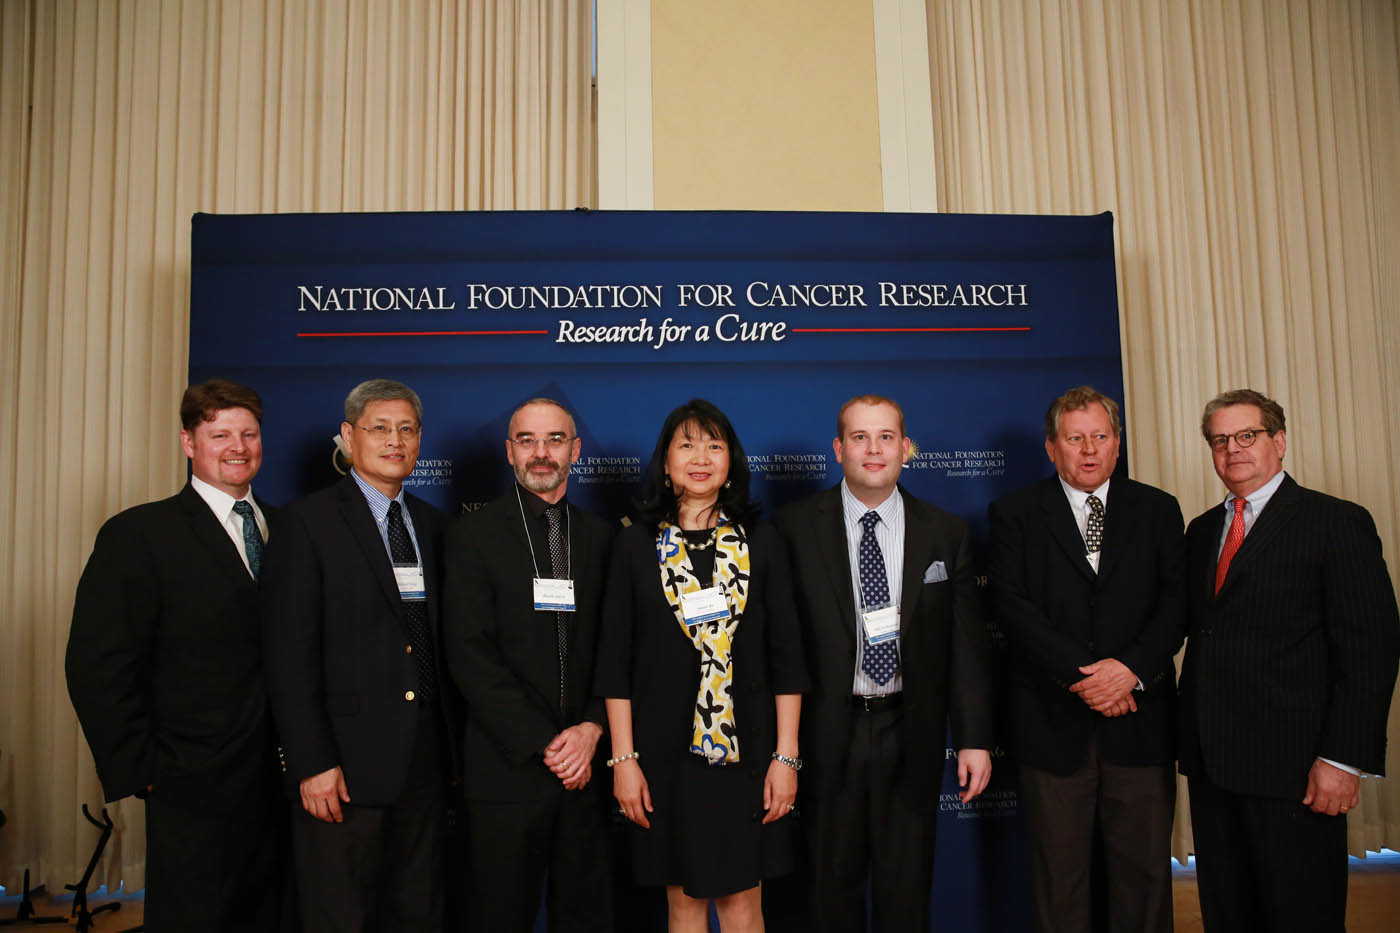 Joe Gillmer, Michael Wang, Sujuan Ba and Franklin Salisbury from NFCR with Ricardo Garcia, Bill Werkmeister, and Web Cavanee